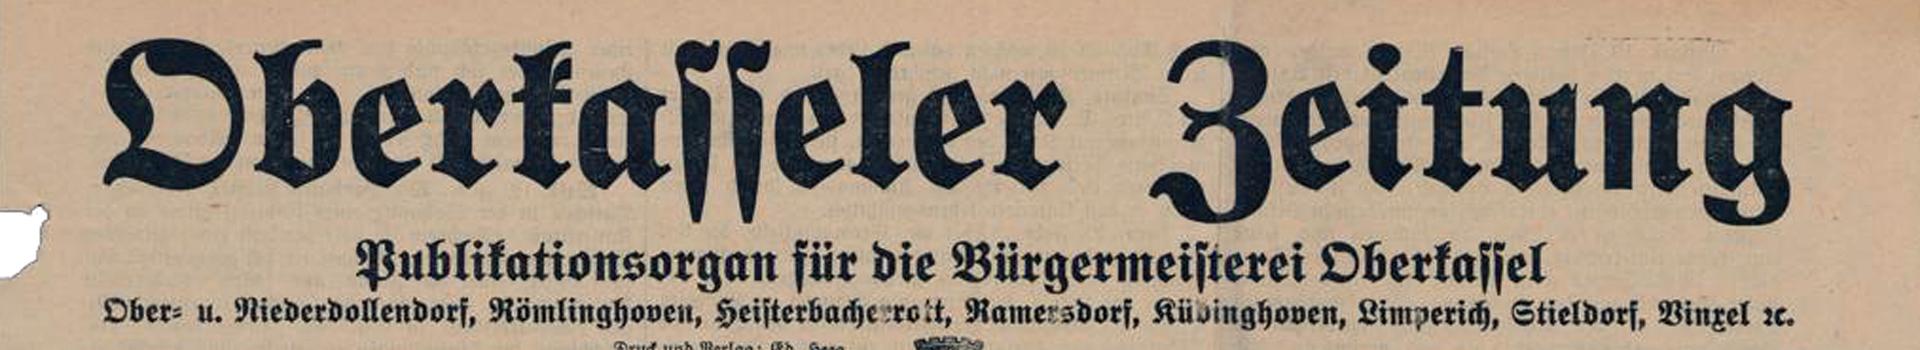 Oberkasseler Zeitung